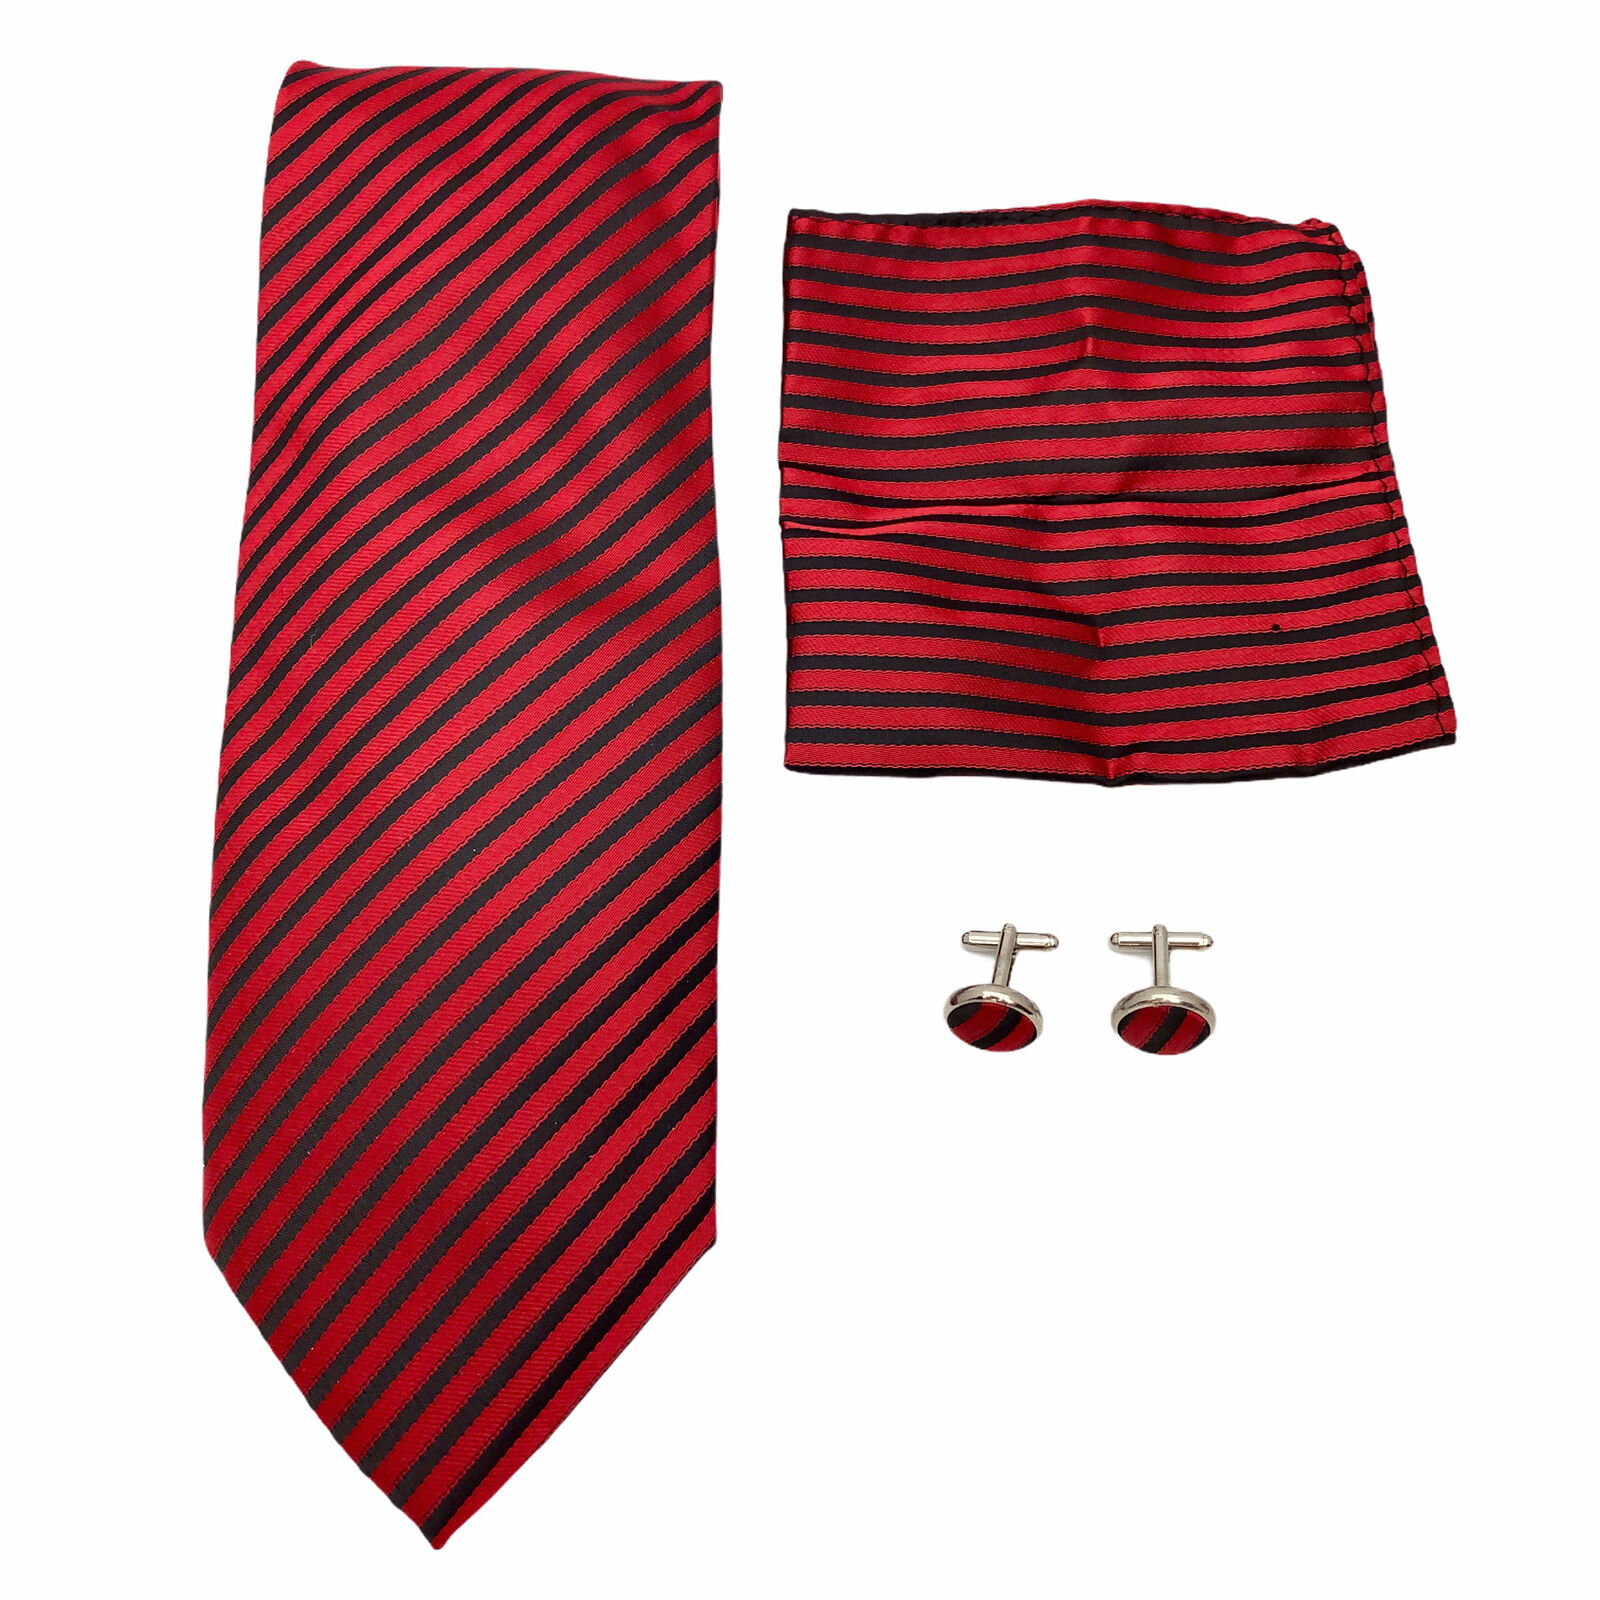 A. Vincenzo Red Black Stripe Neck Tie Pocket Square Cufflink Matching Dress Set